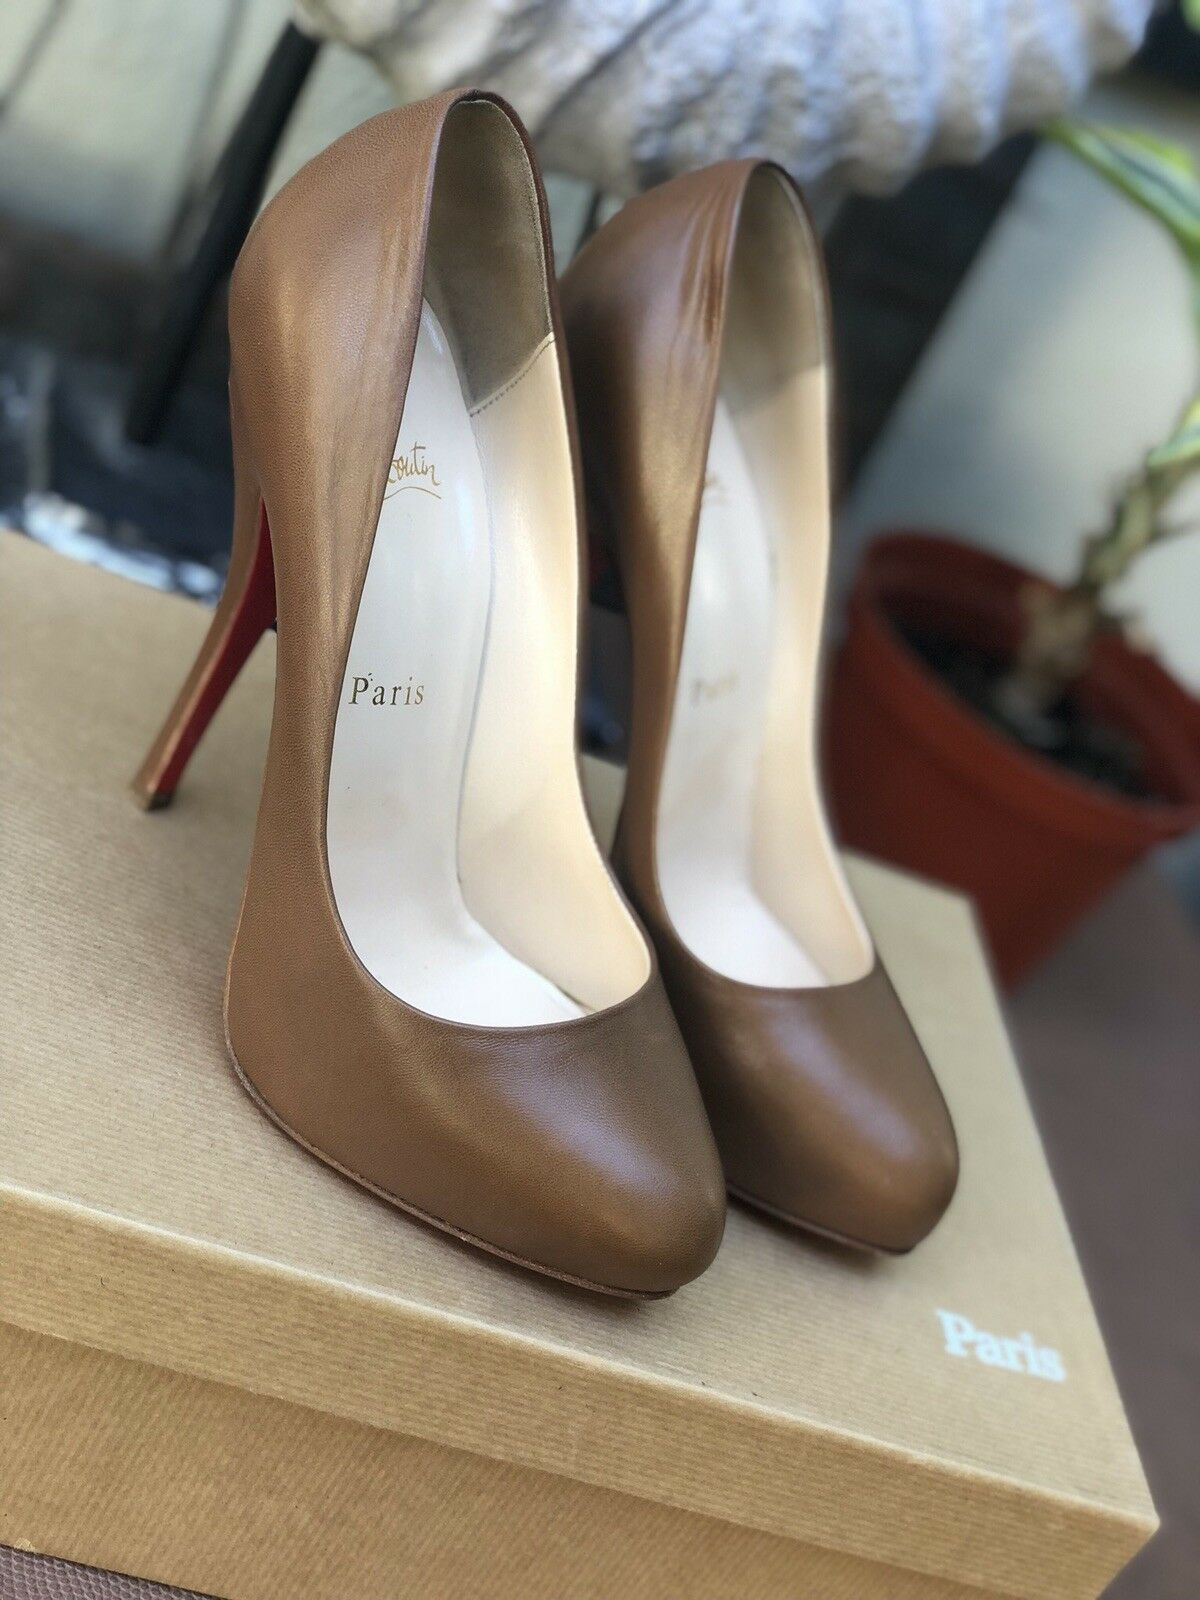 Christian Louboutin Authentic Feticha TAN 120 Kid sz 37.5 heels chaussures Pumps